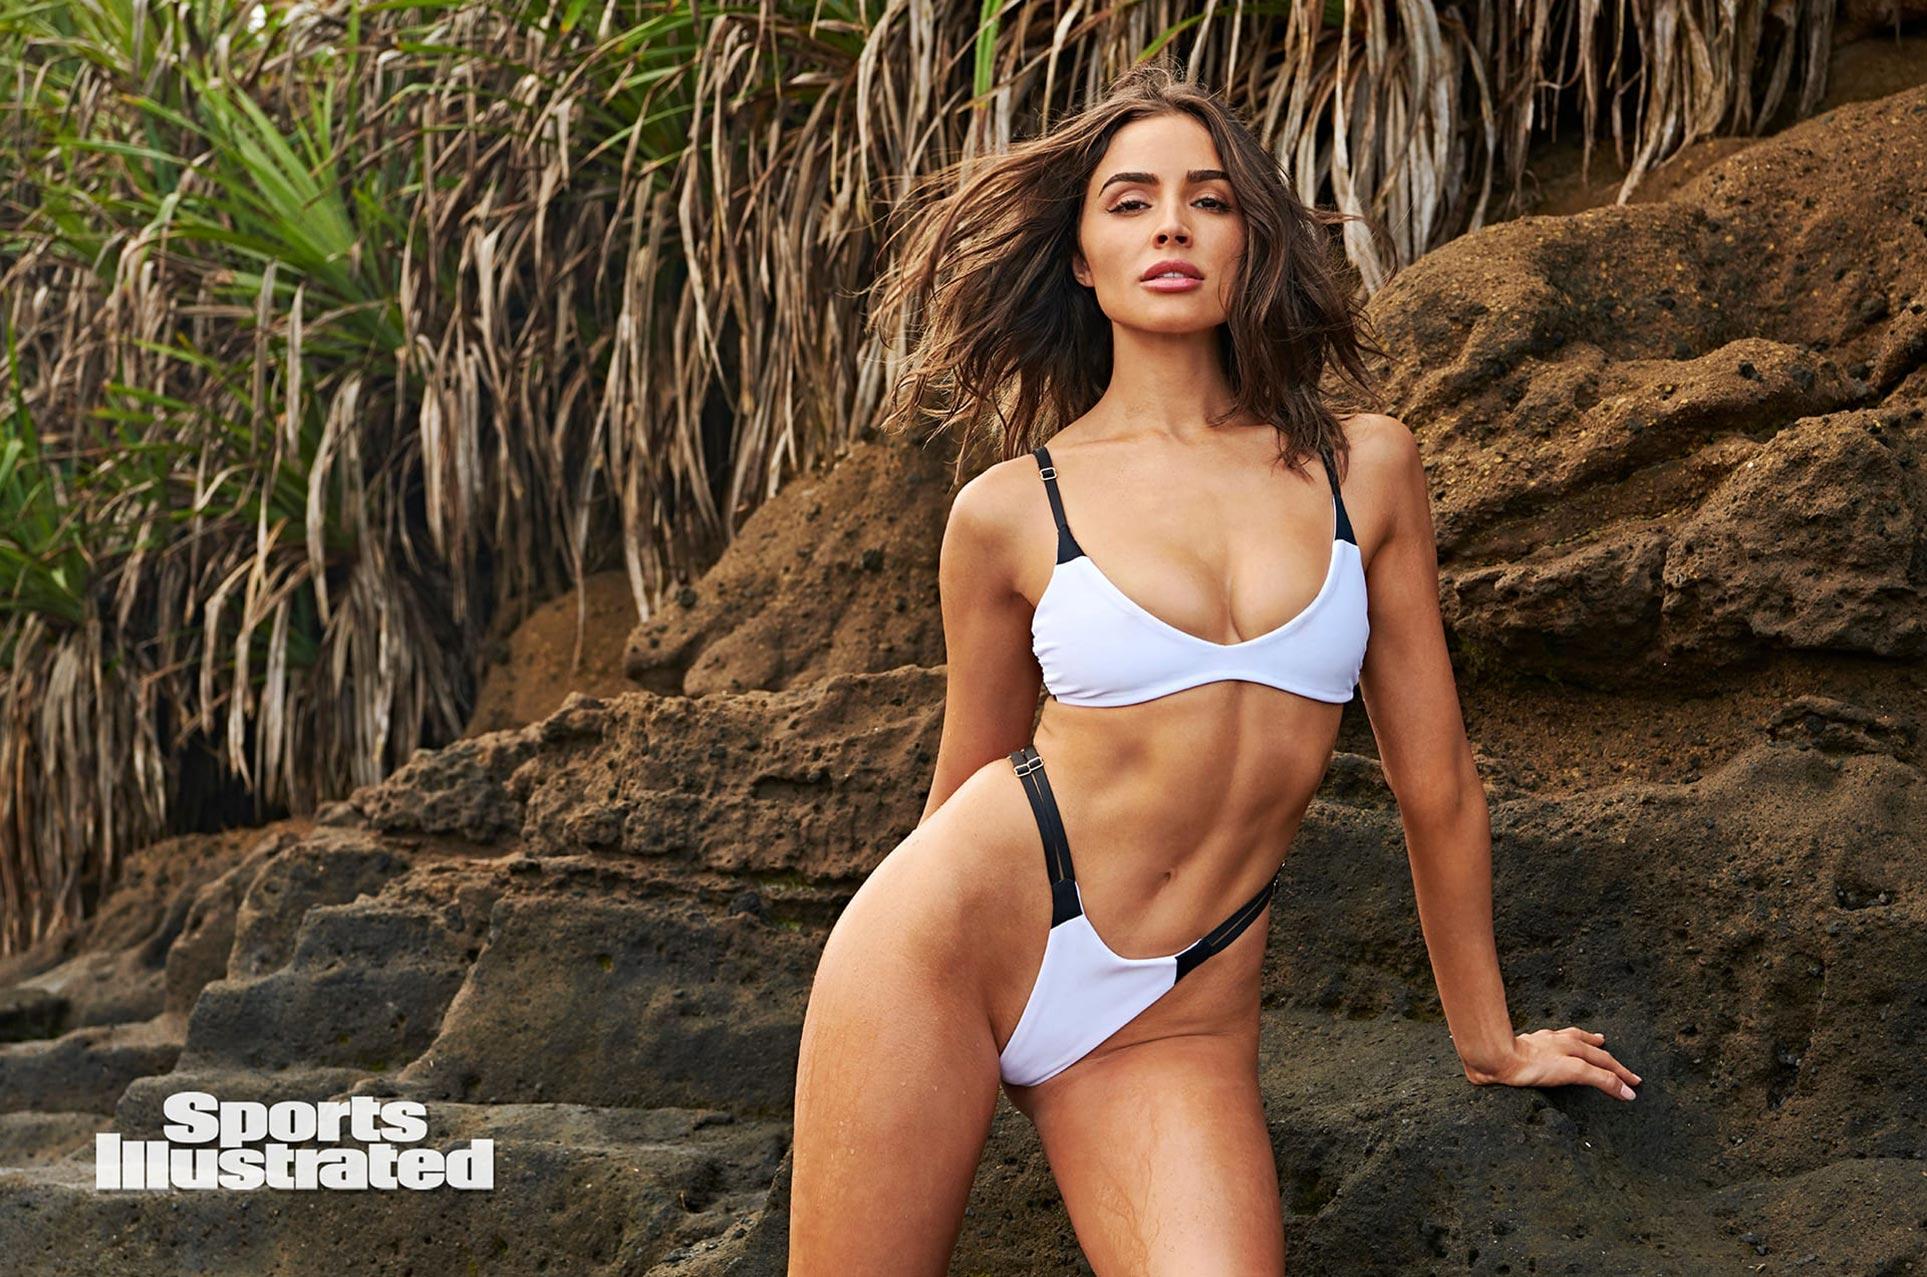 Оливия Калпо в каталоге купальников Sports Illustrated Swimsuit 2020 / фото 10